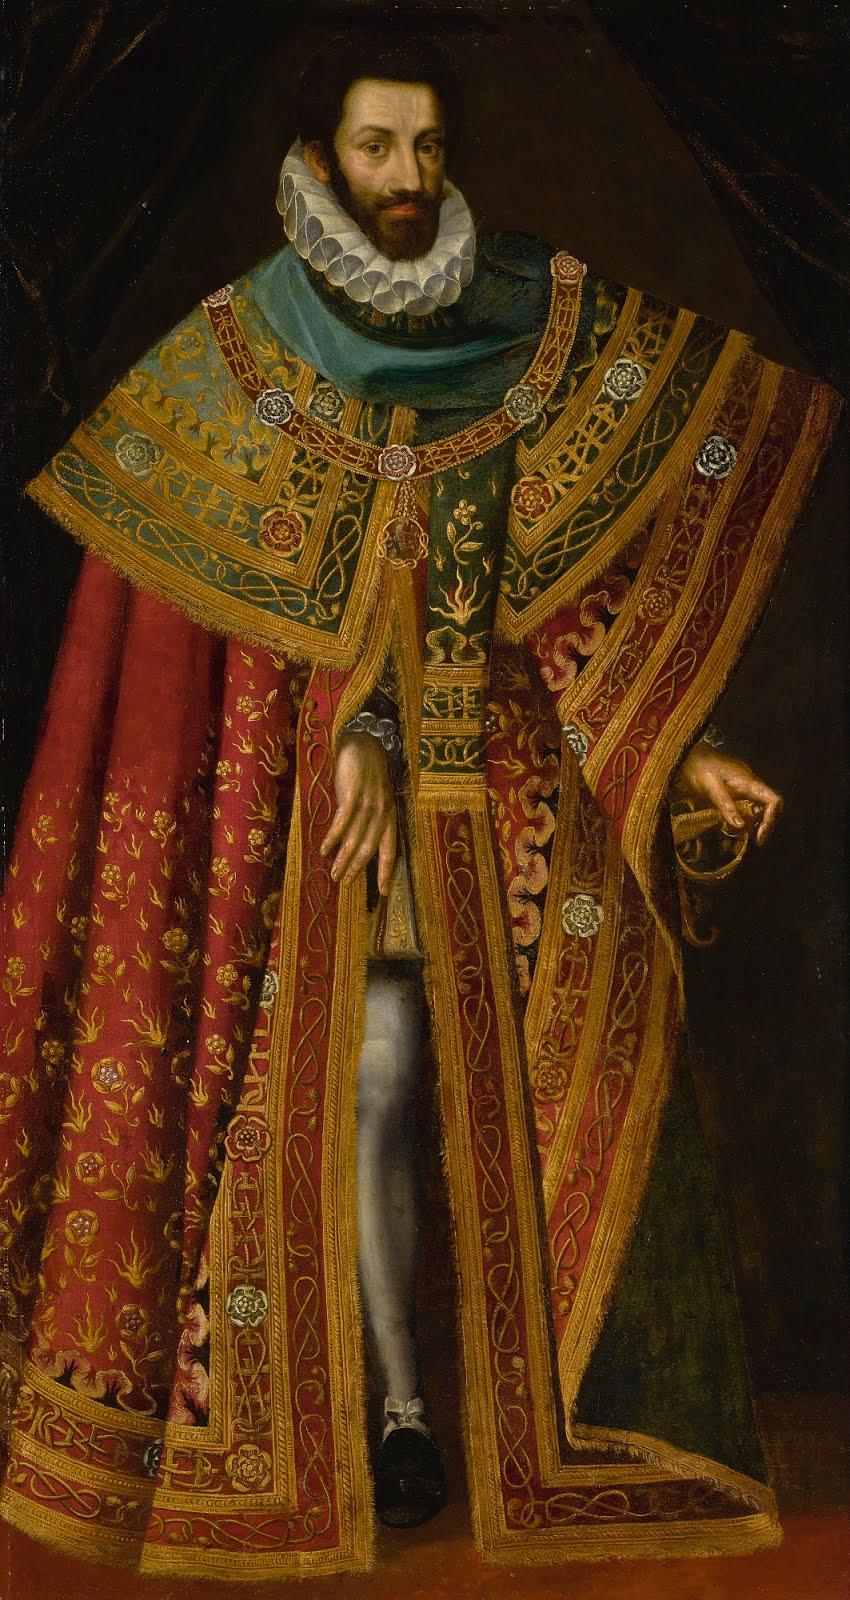 16.-Emanuele Filiberto di Savoia